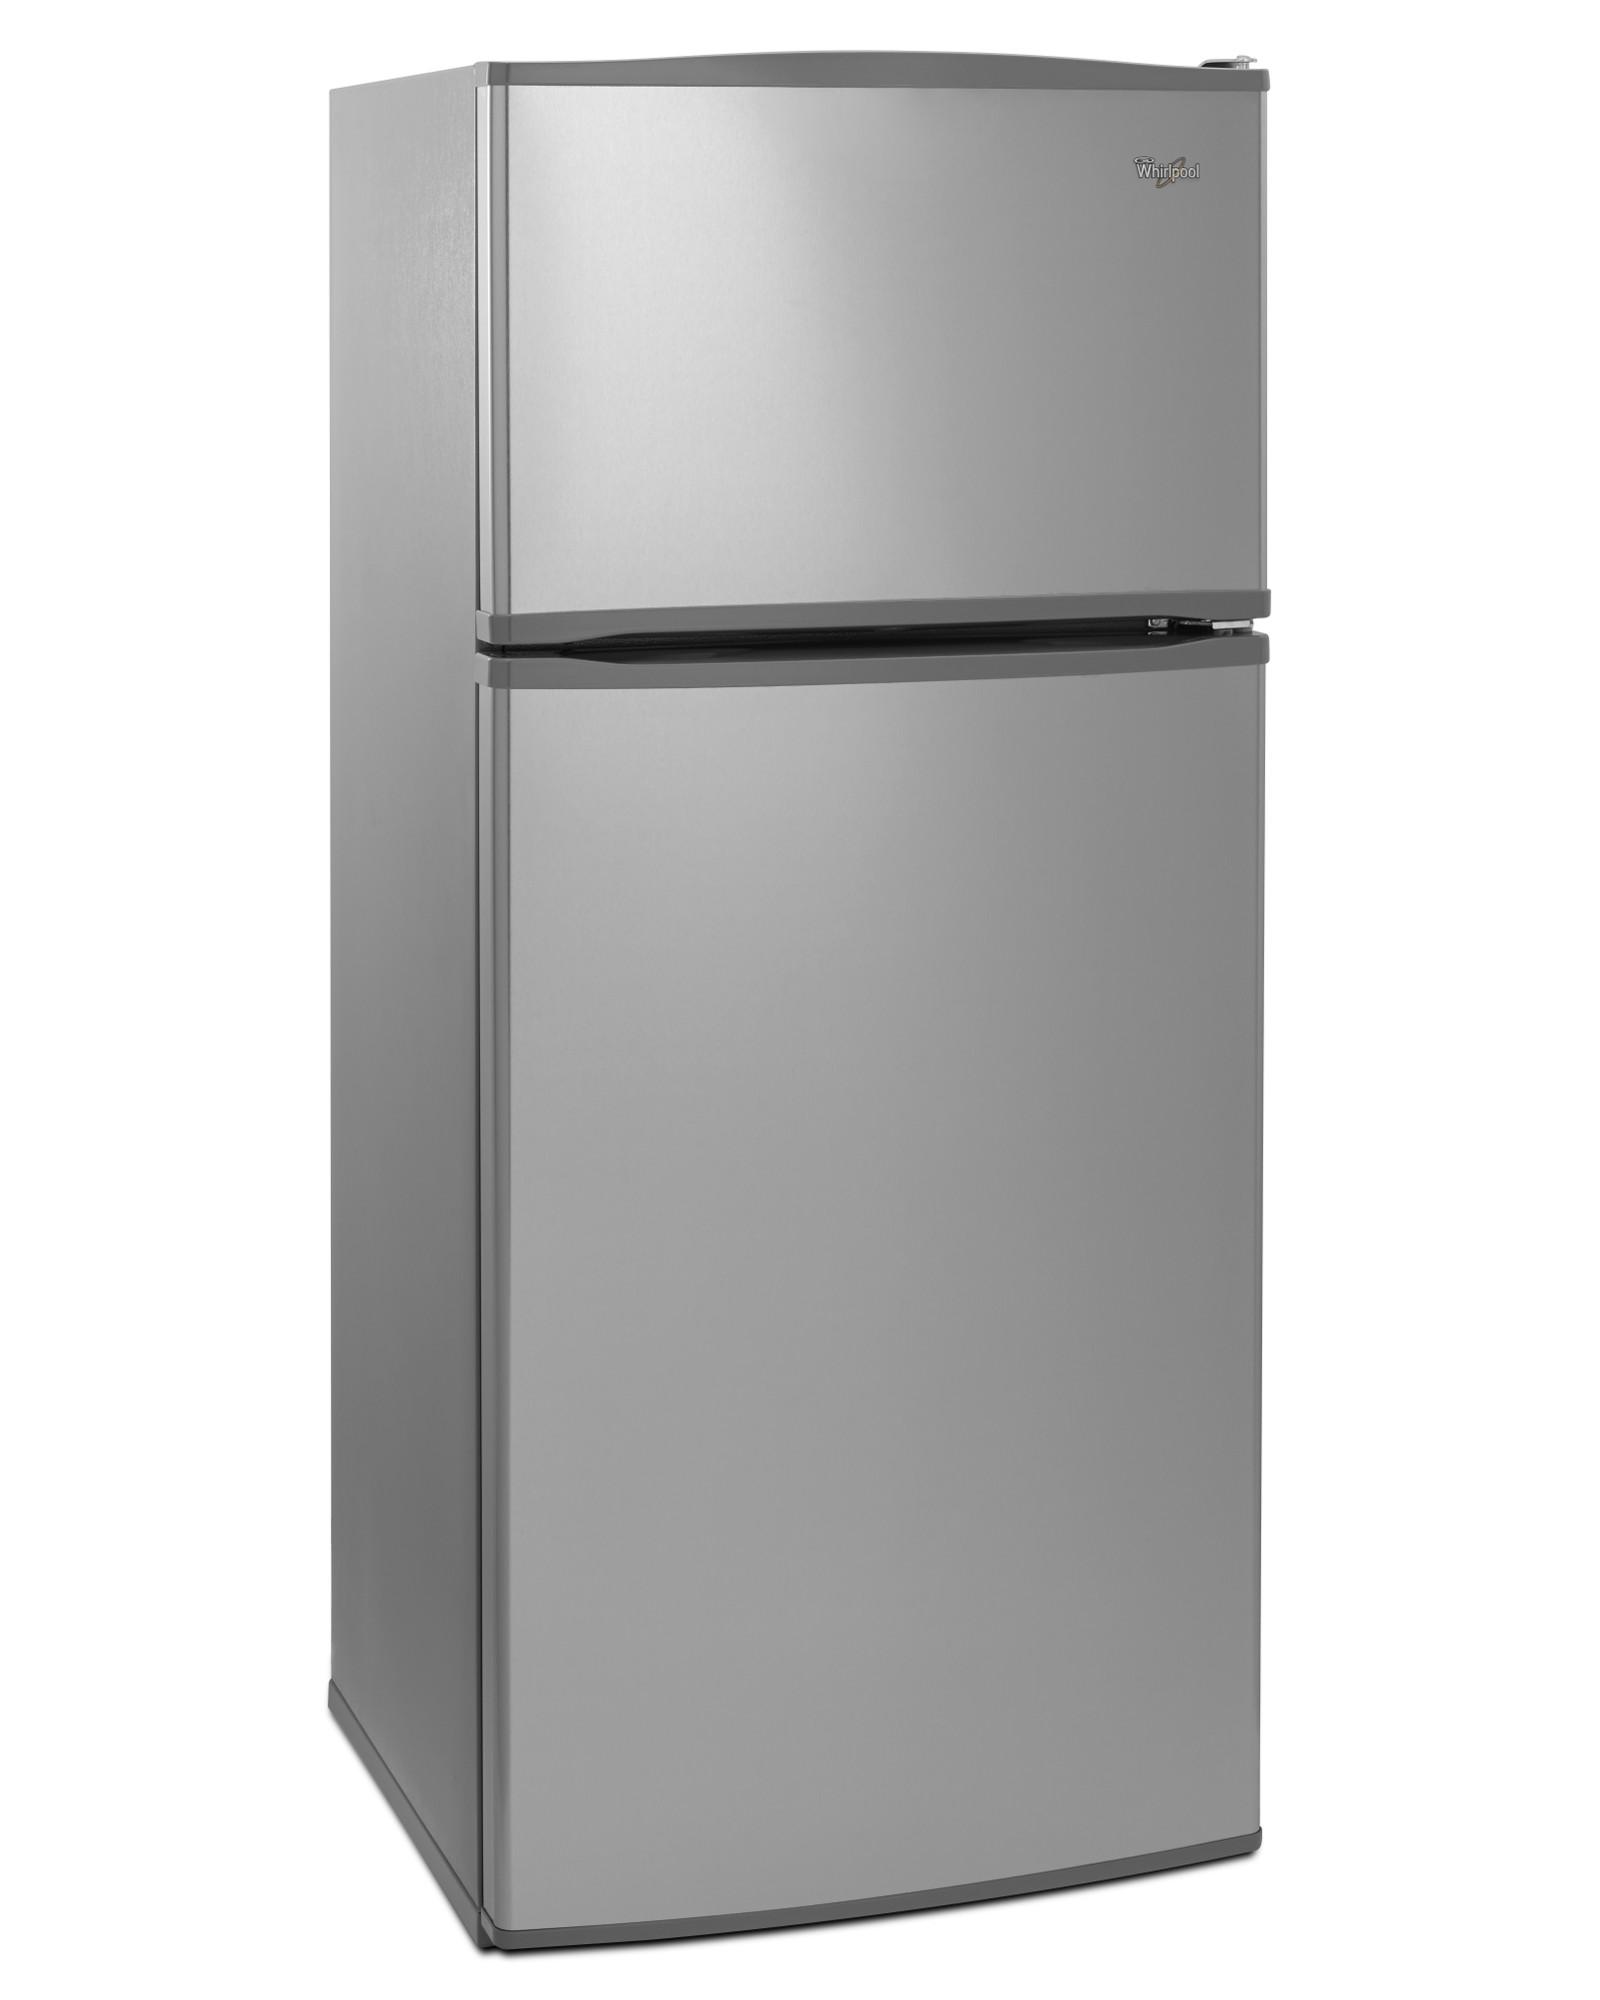 Whirlpool WRT316SFDM 16 cu. ft. Top Freezer Refrigerator - Stainless Steel